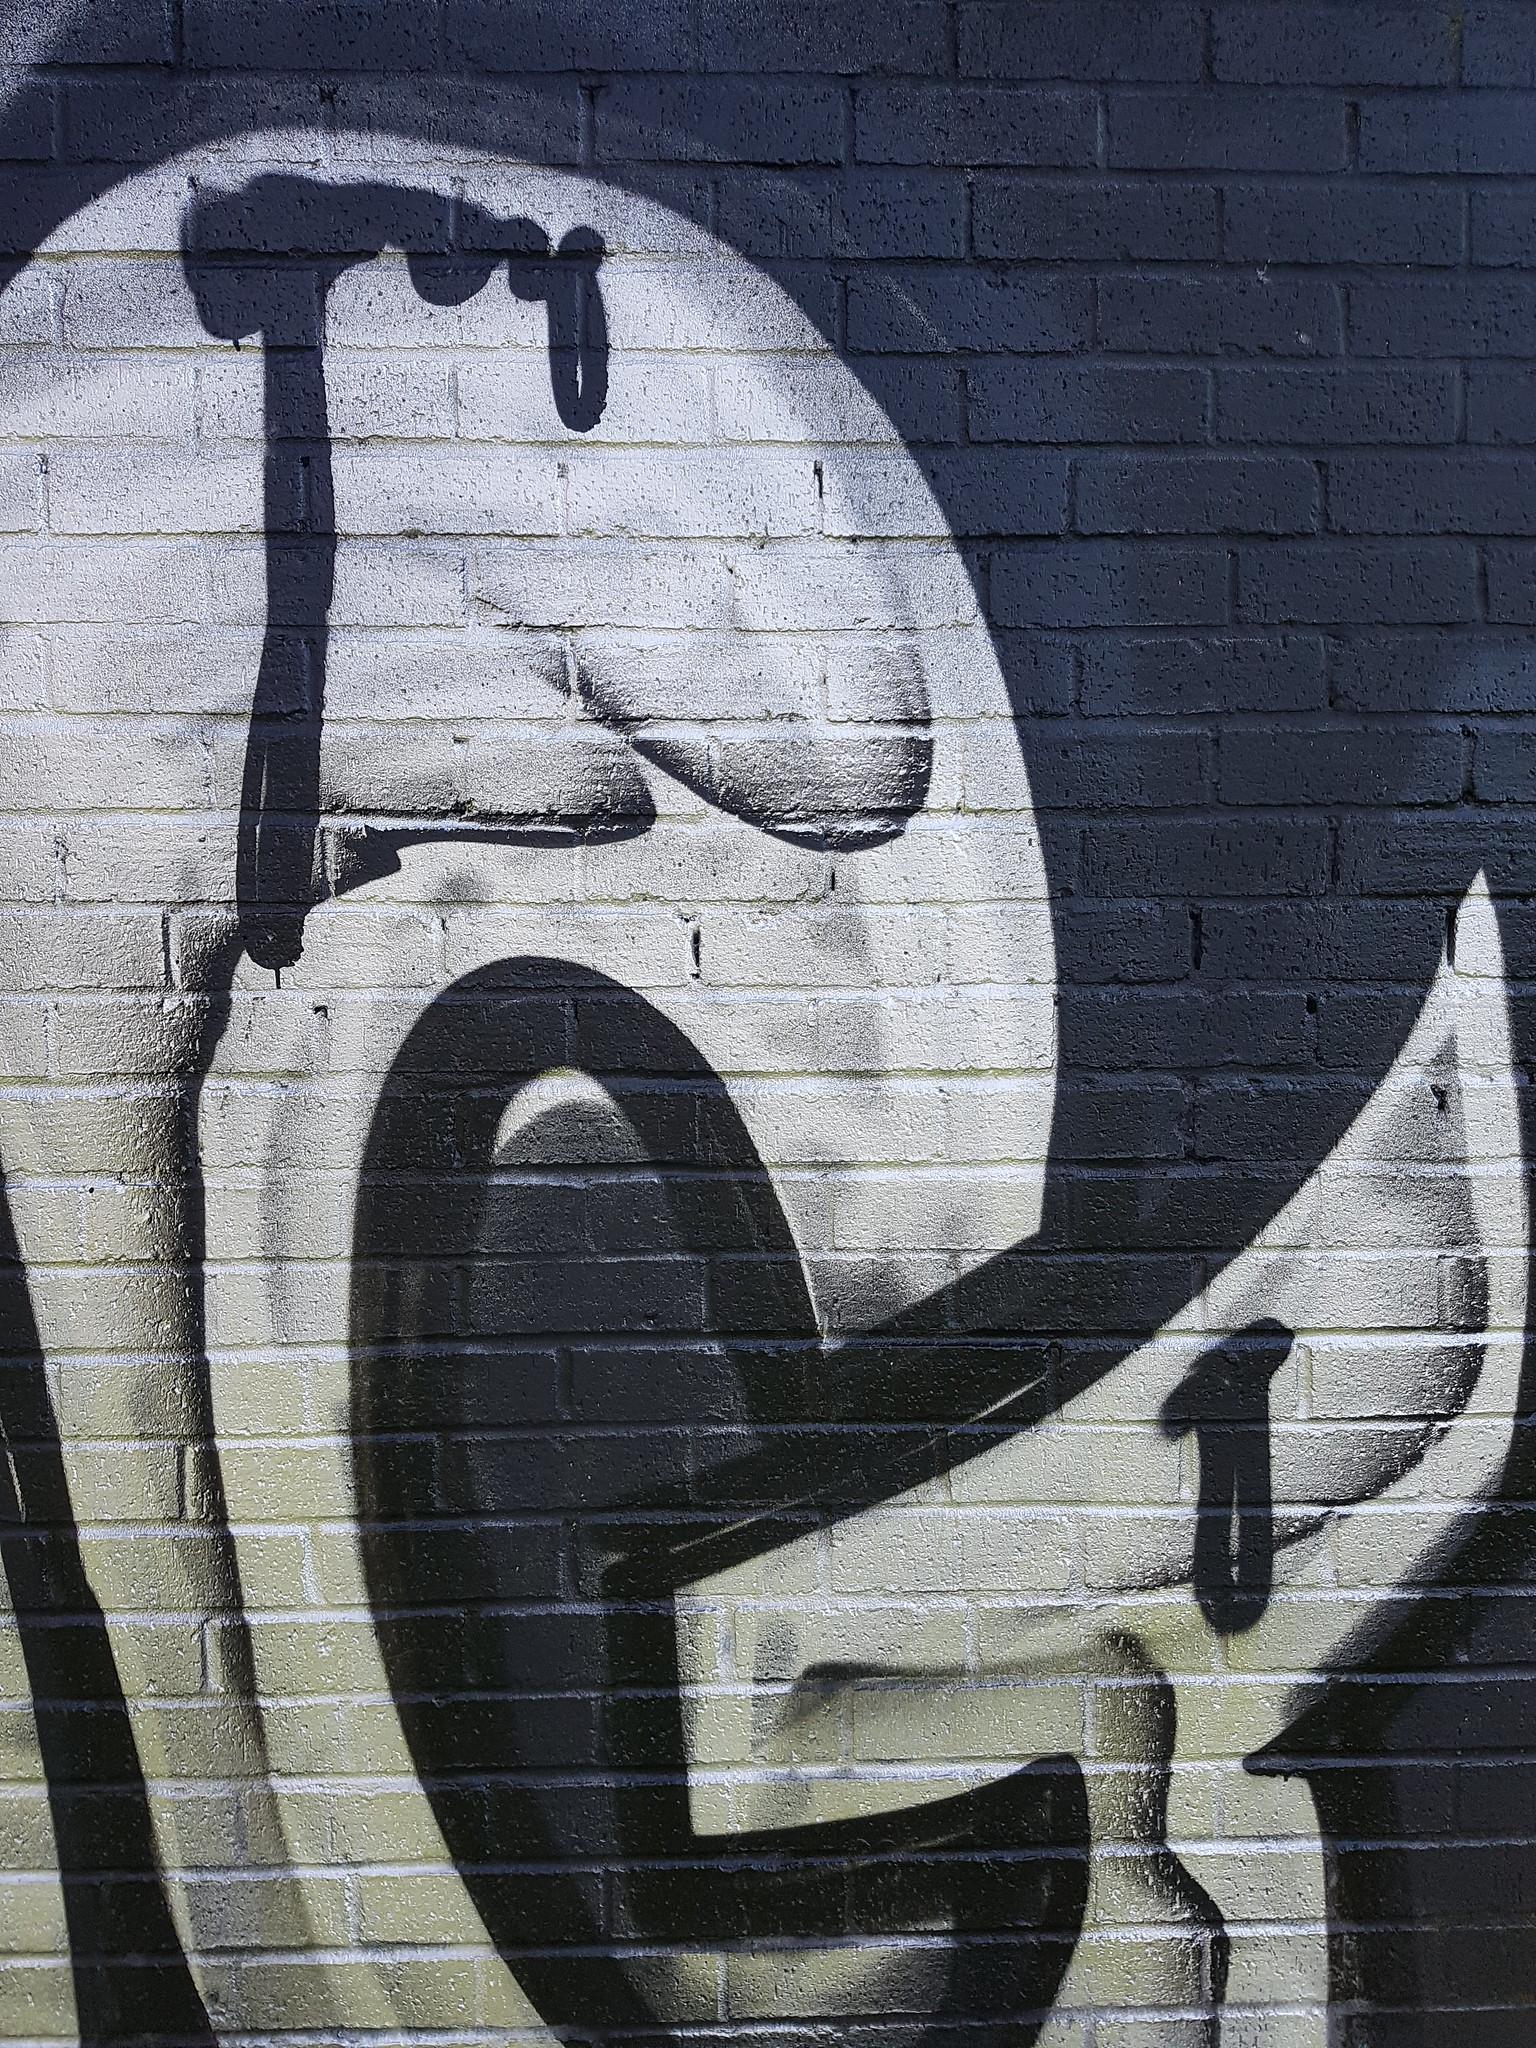 WG graffiti, Jubilee Park, Cardiff